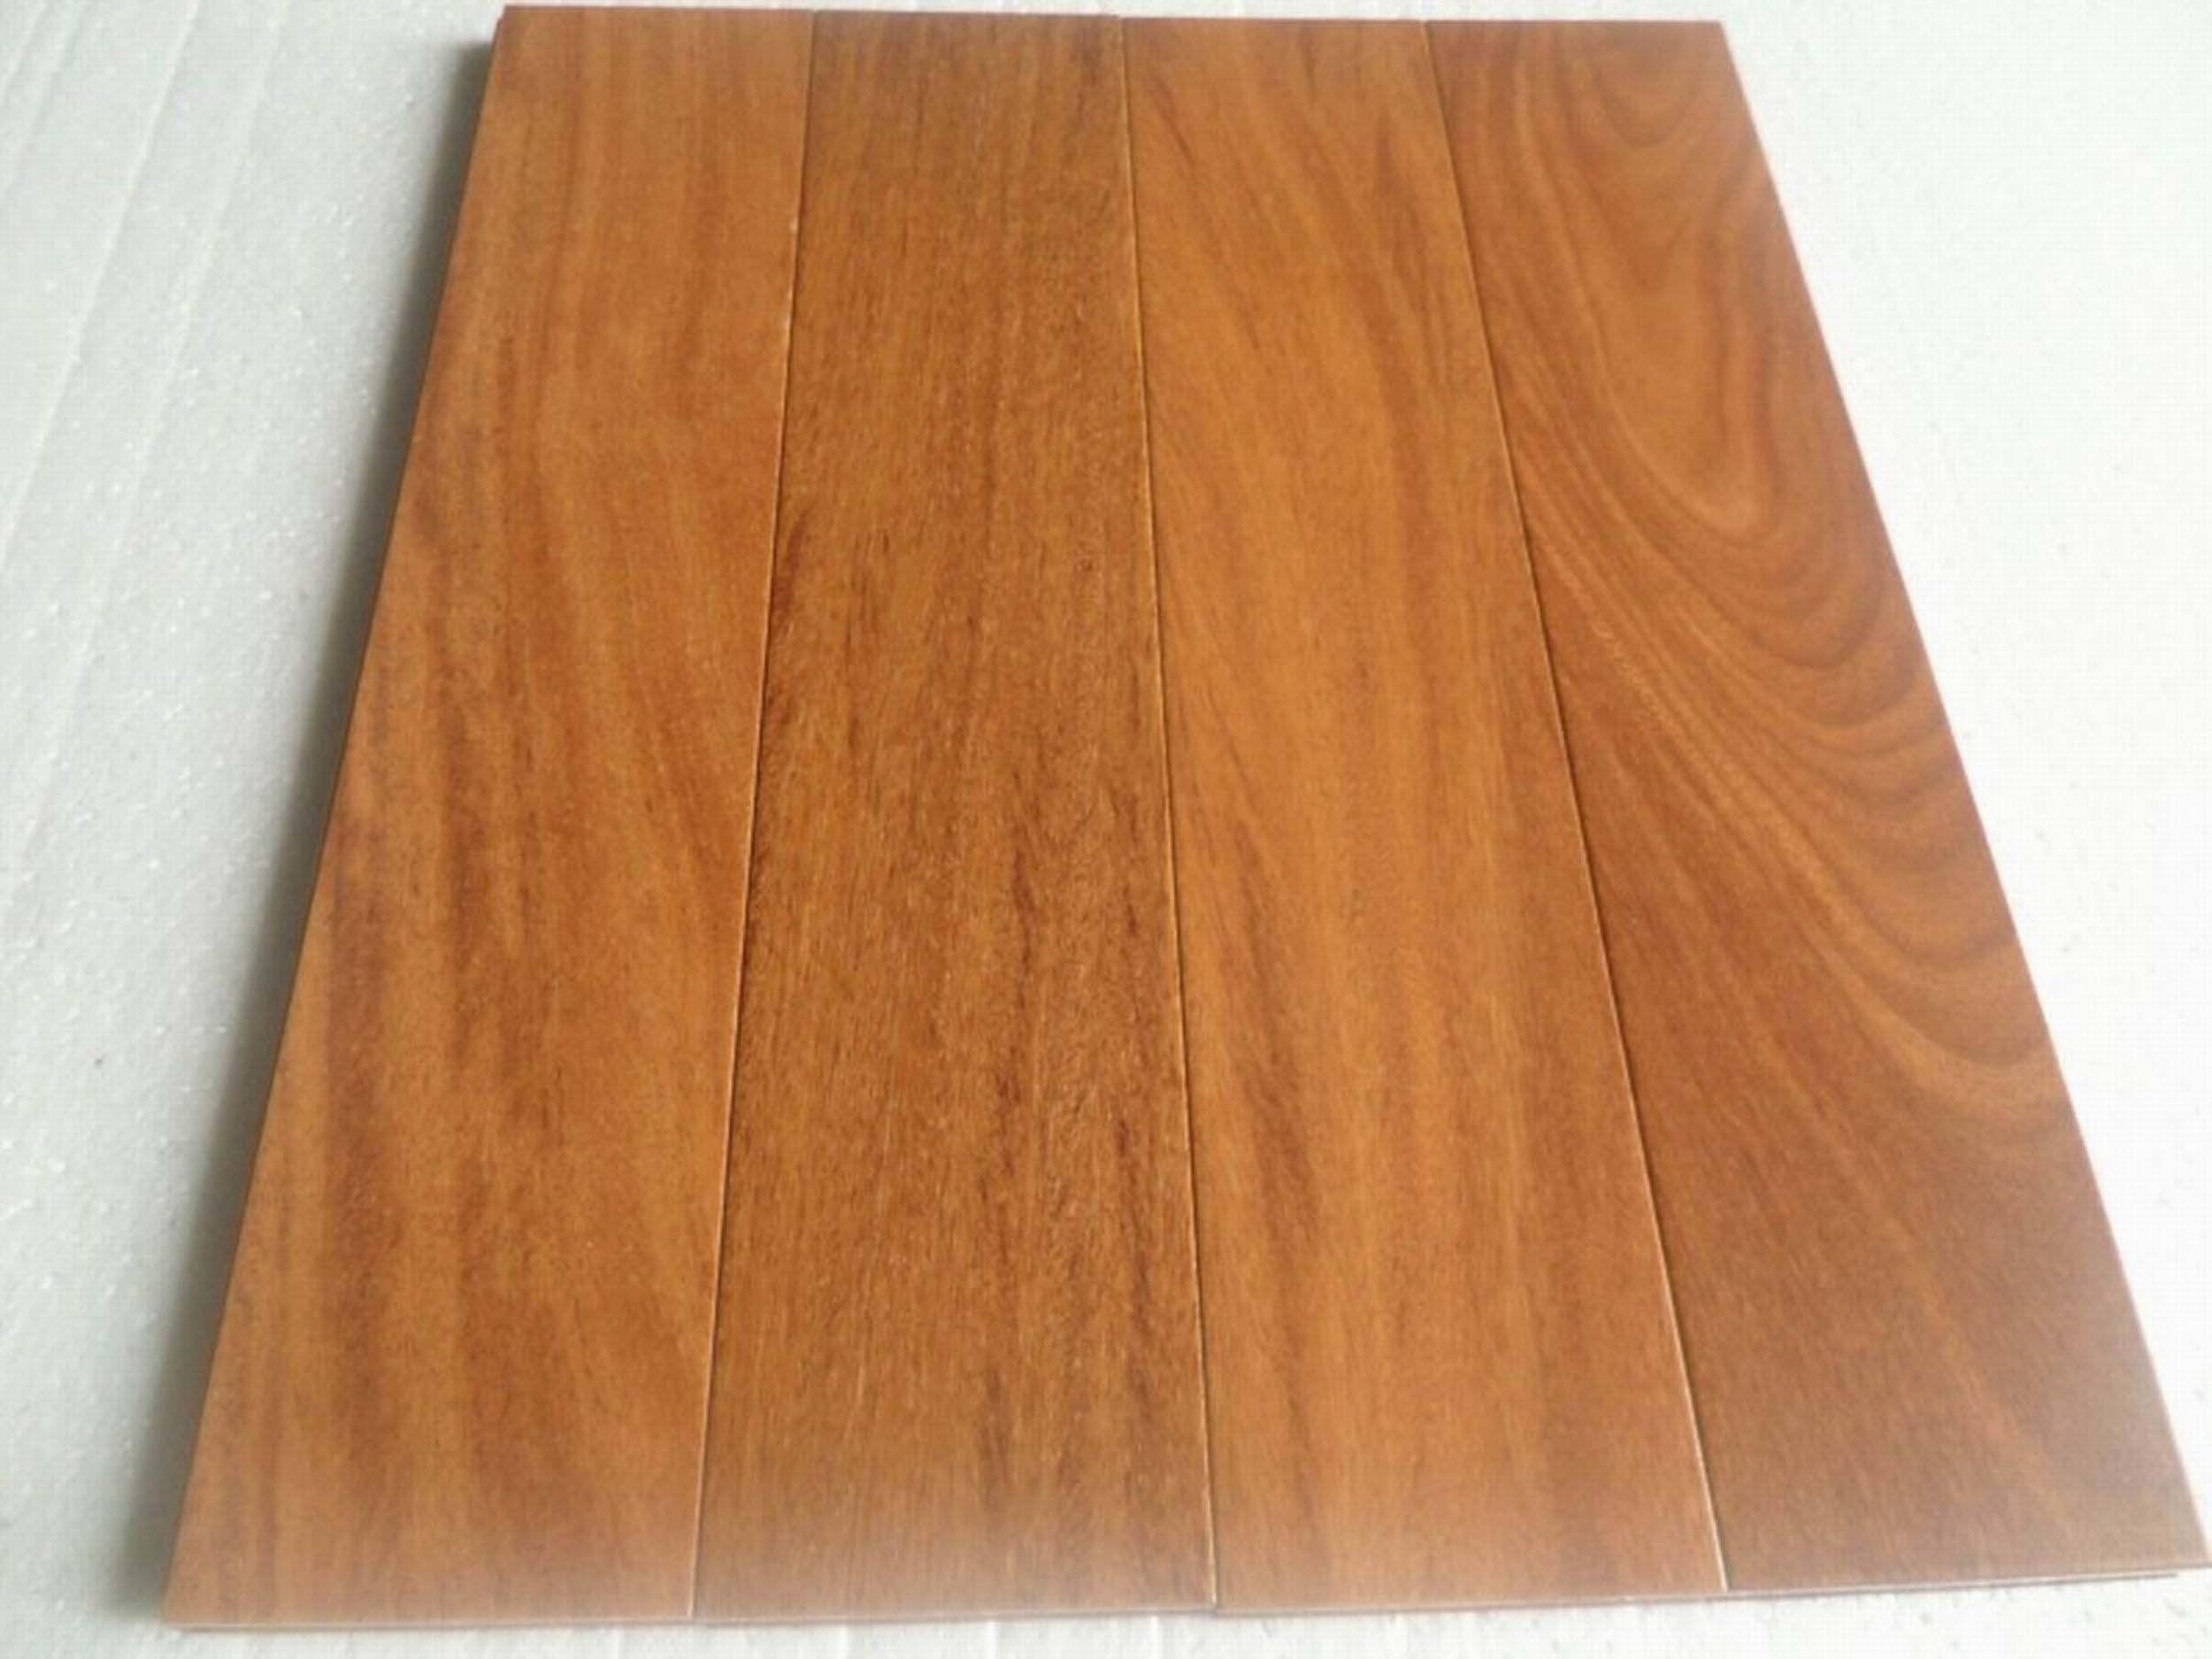 parquet flooring suppliers lane finish floor oil solid wood mat sandy mosiac blocks size bristol oak uk tumbled